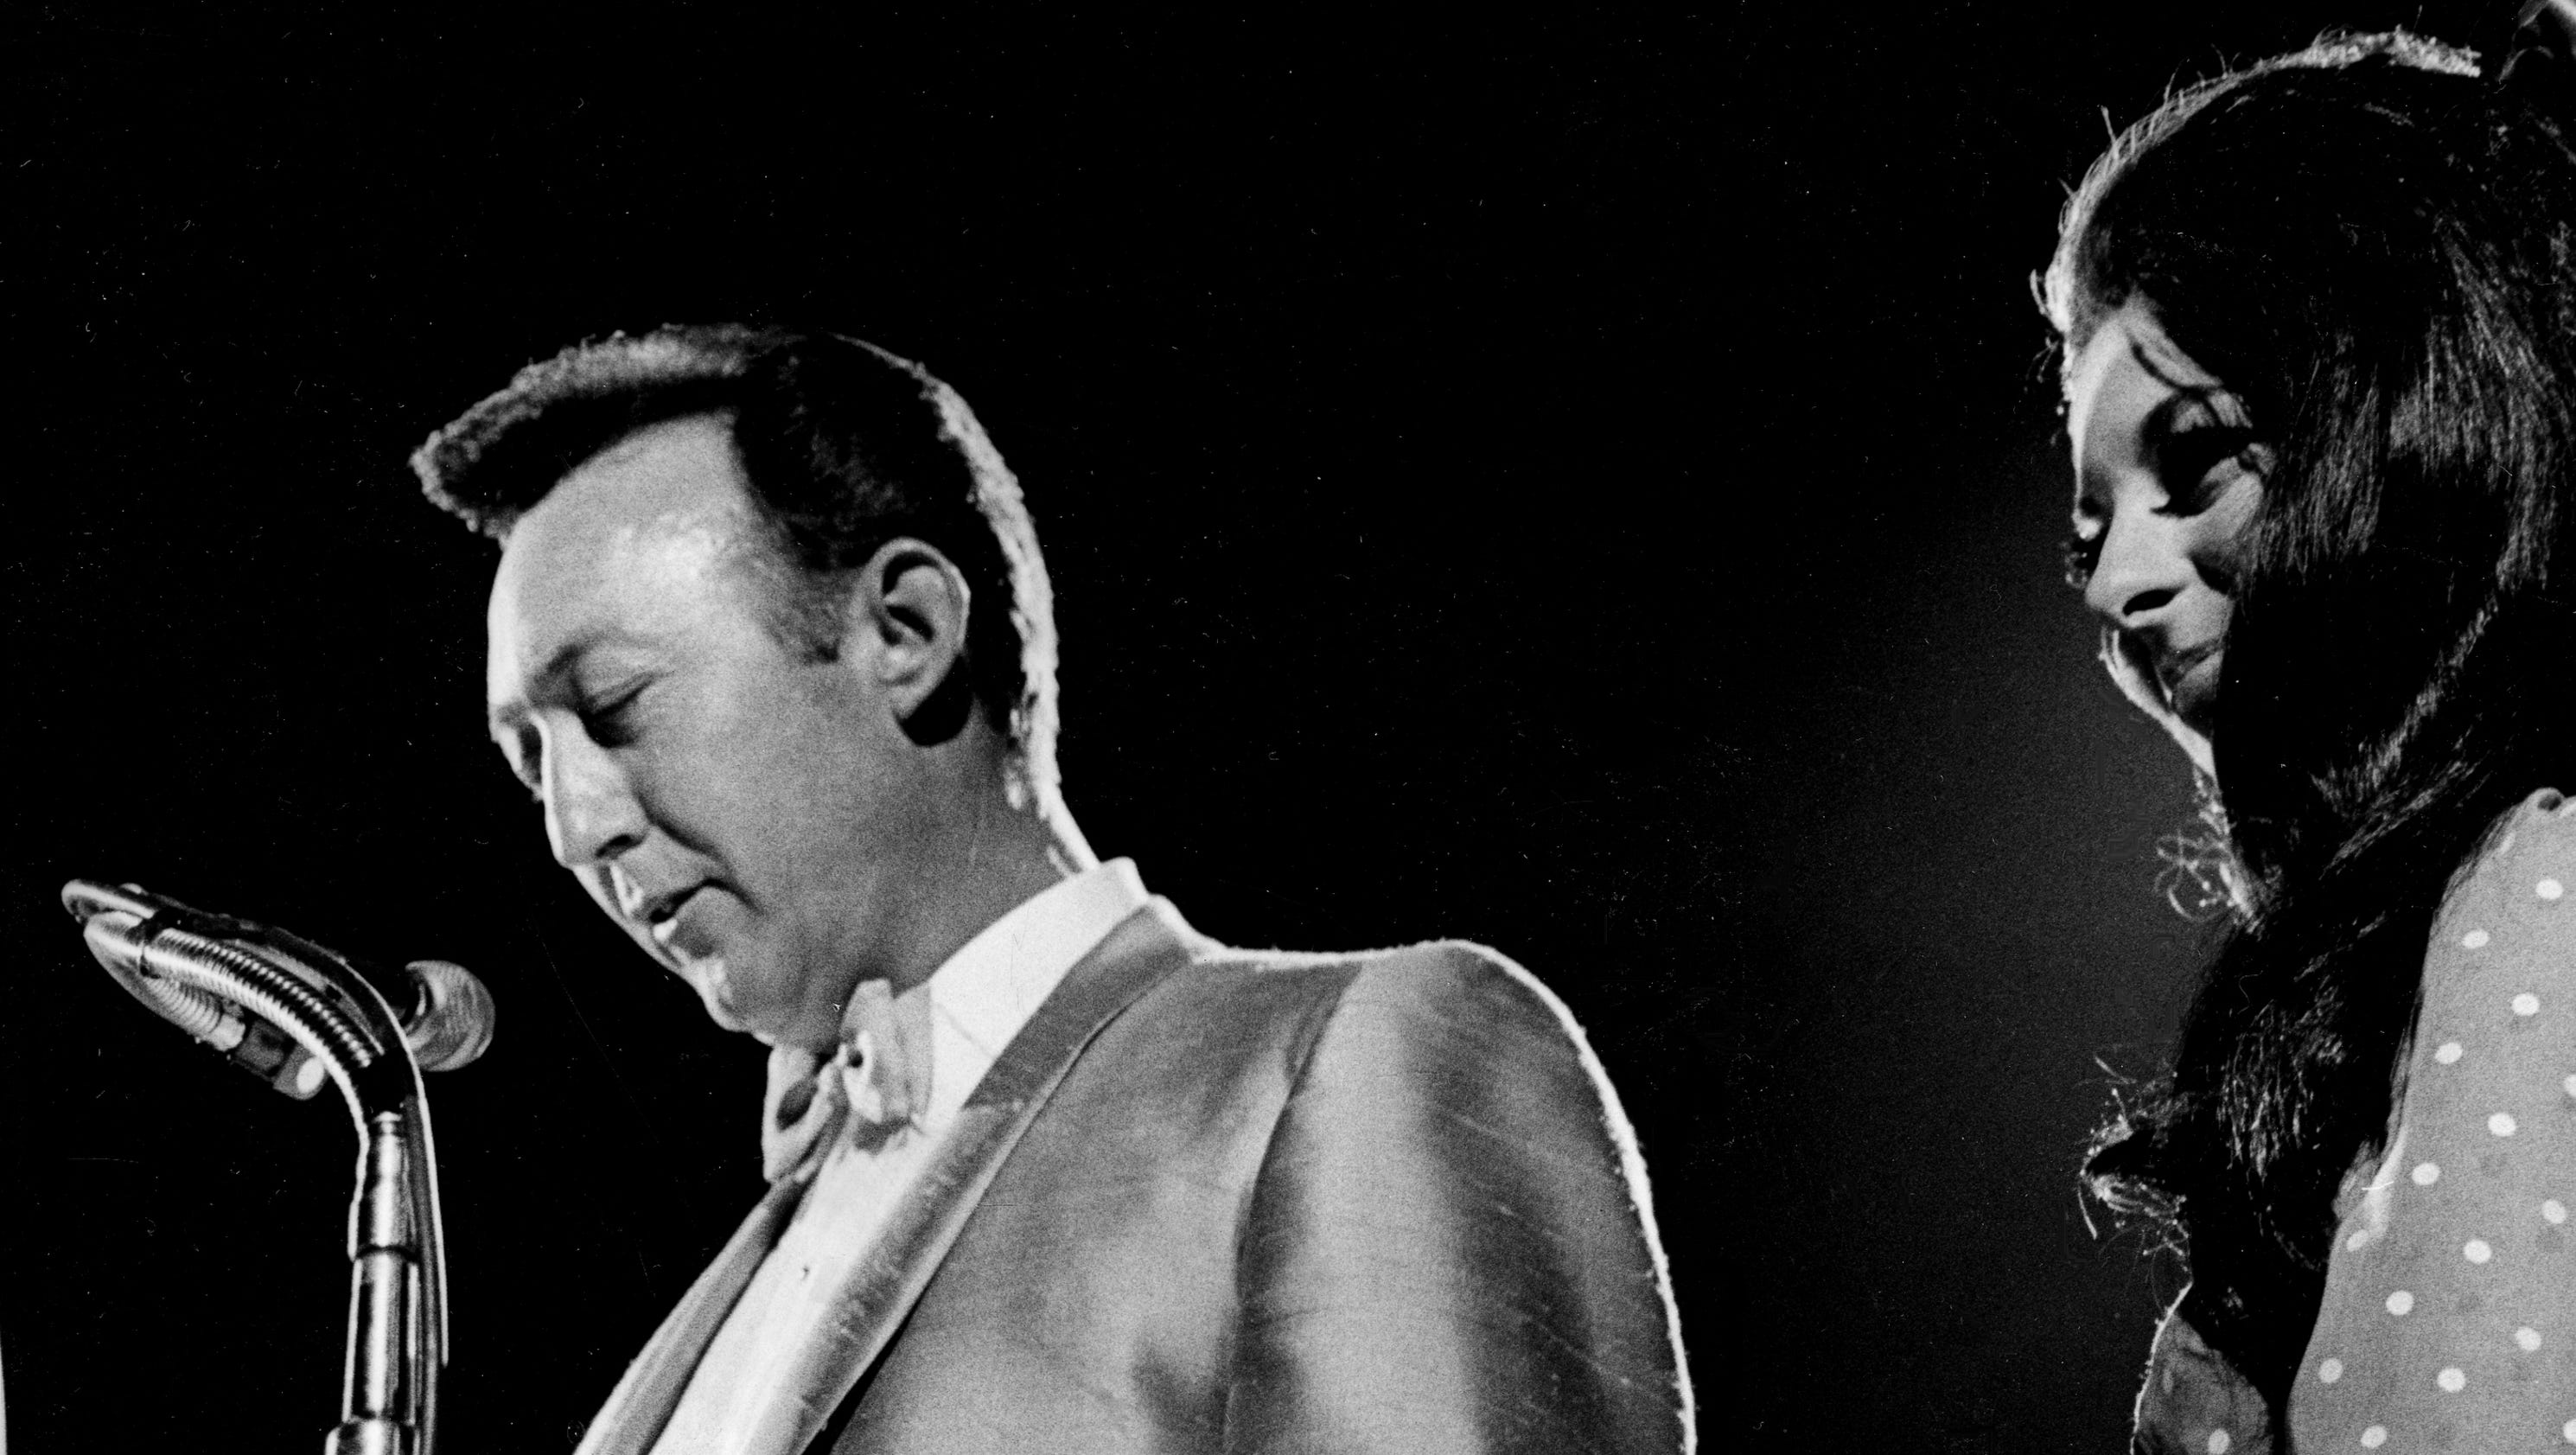 Nashville Then: 1967 CMA Awards show